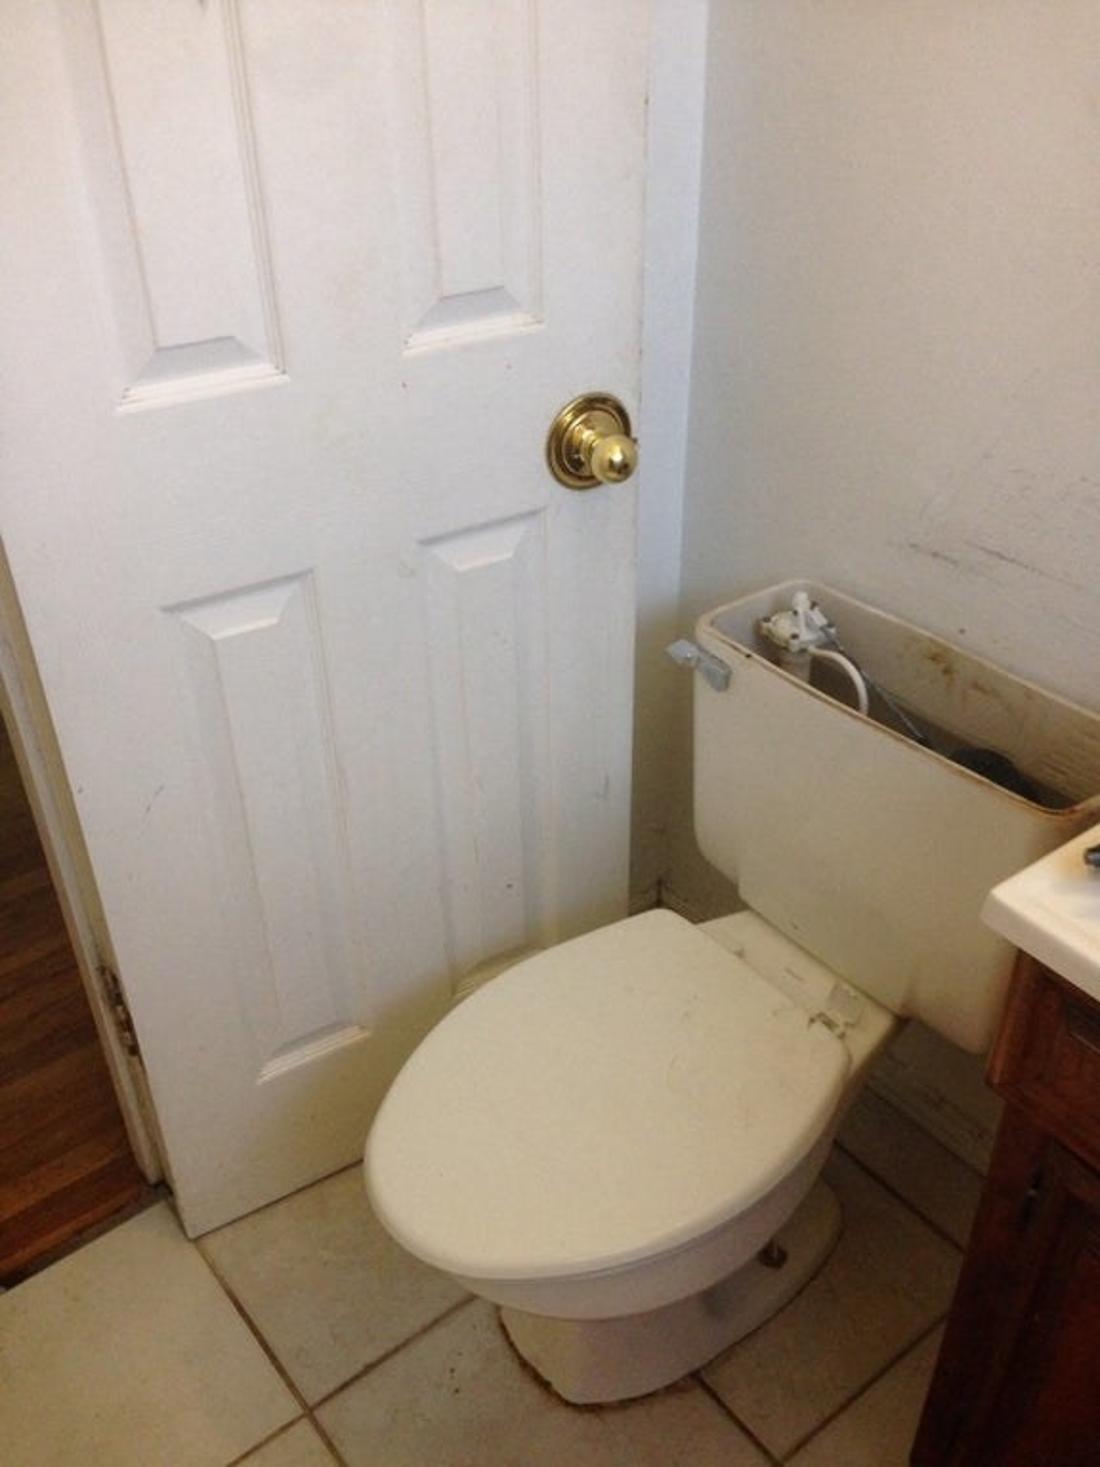 toilet blocking a door from closing